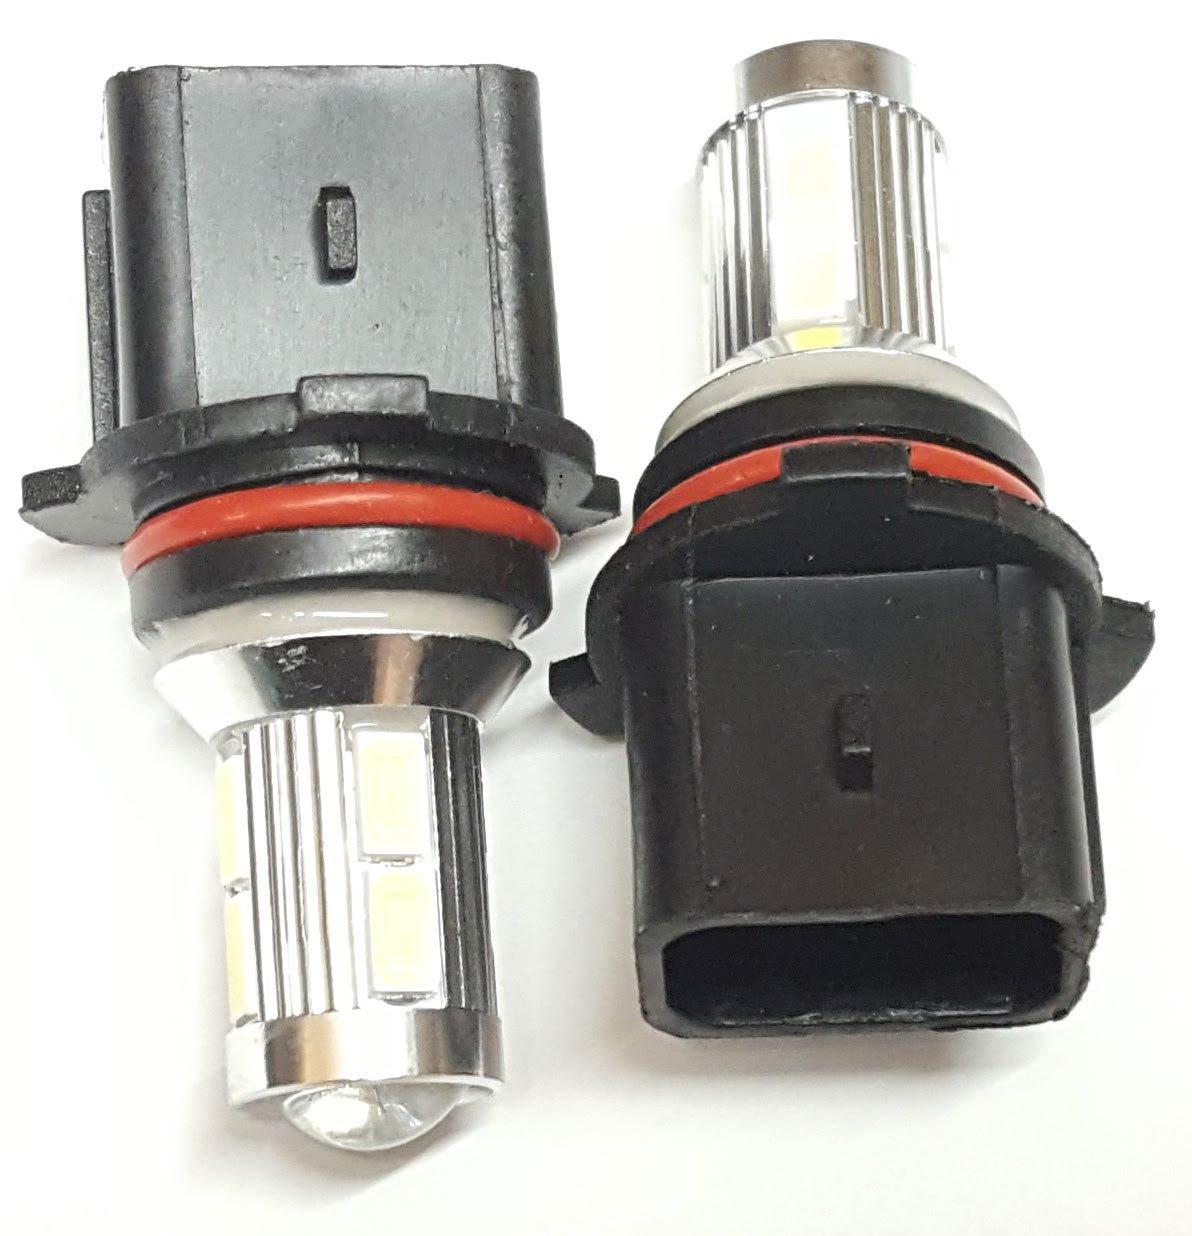 9SMD Luci diurne a LED lampadine Canbus CREE DRL P13 W bianco EB3R1 MCK Auto